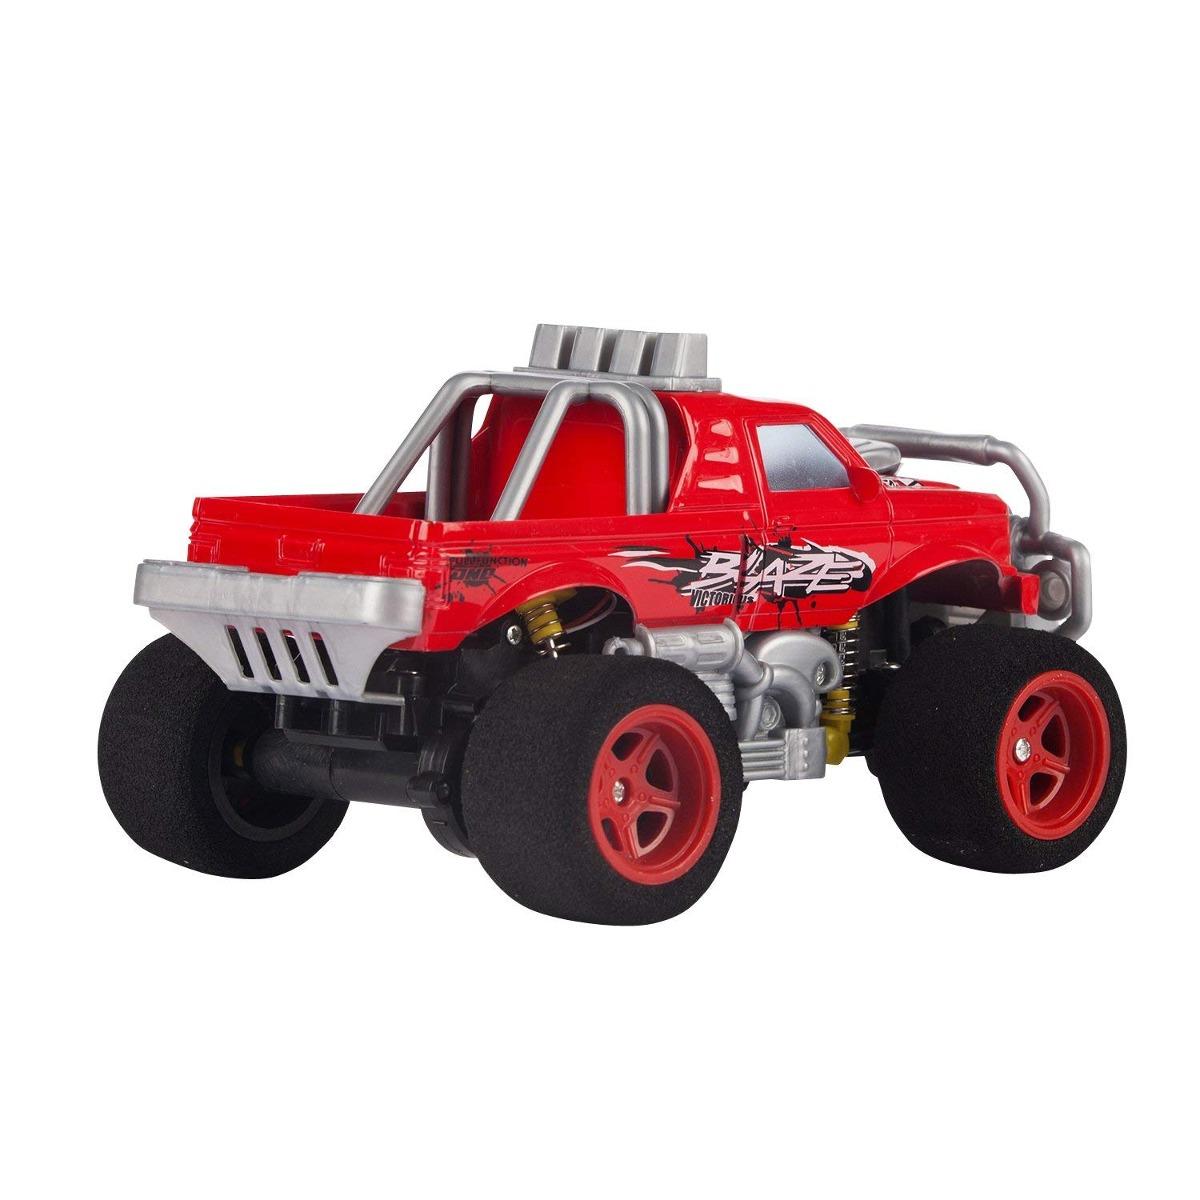 Juguete Co Deportivo Rojo De Coche Vehículo Utilitario Rc Nn0wm8